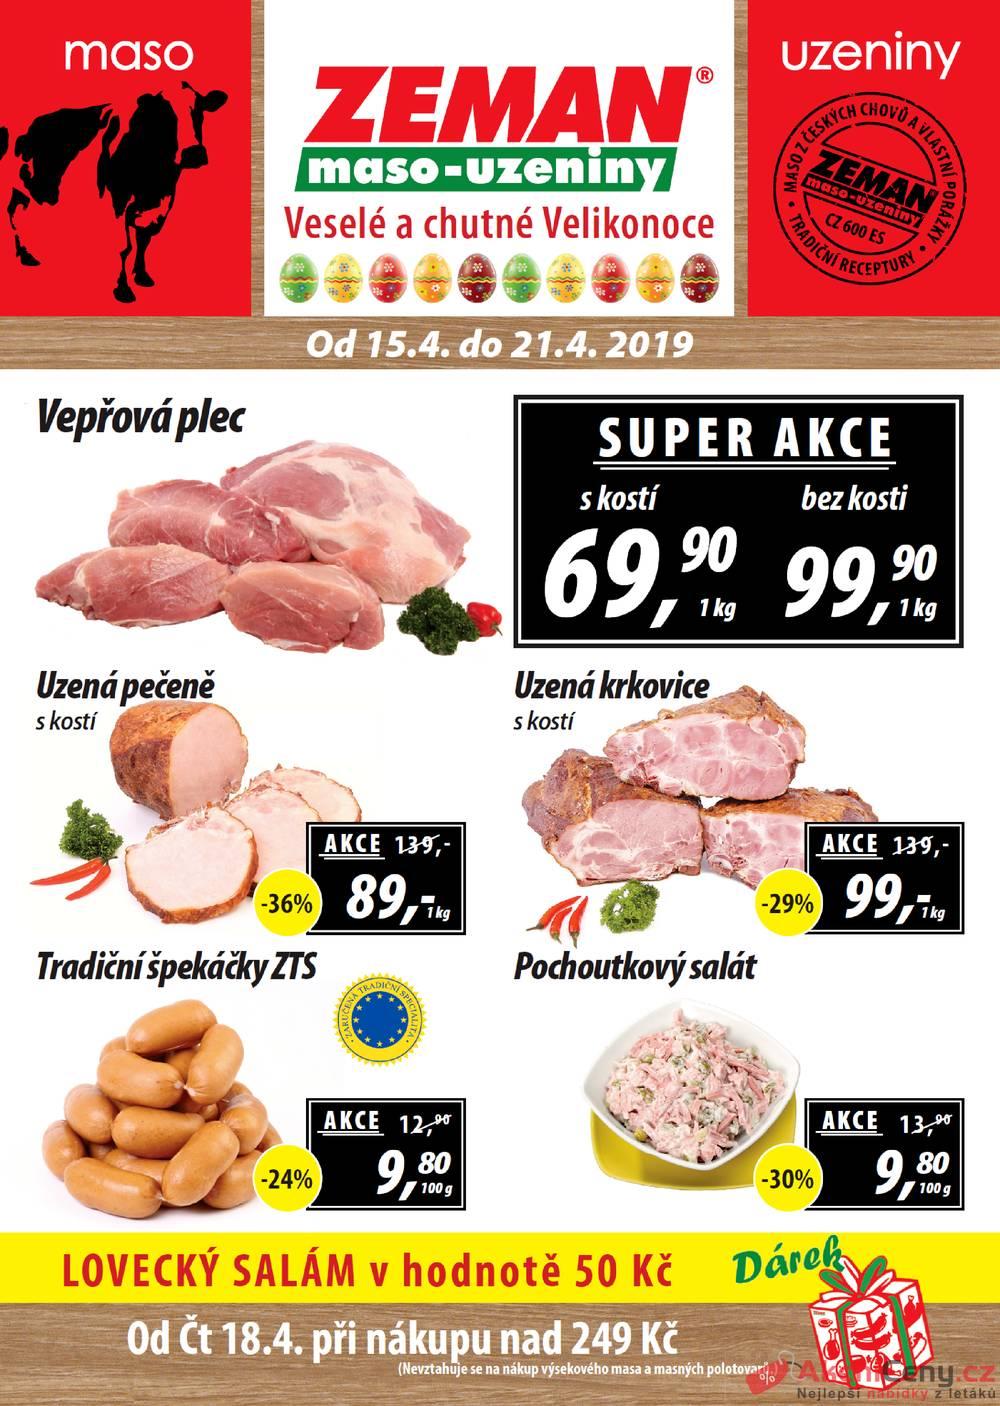 Leták ZEMAN maso-uzeniny - Zeman maso-uzeniny 15.4. - 21.4.  - strana 1